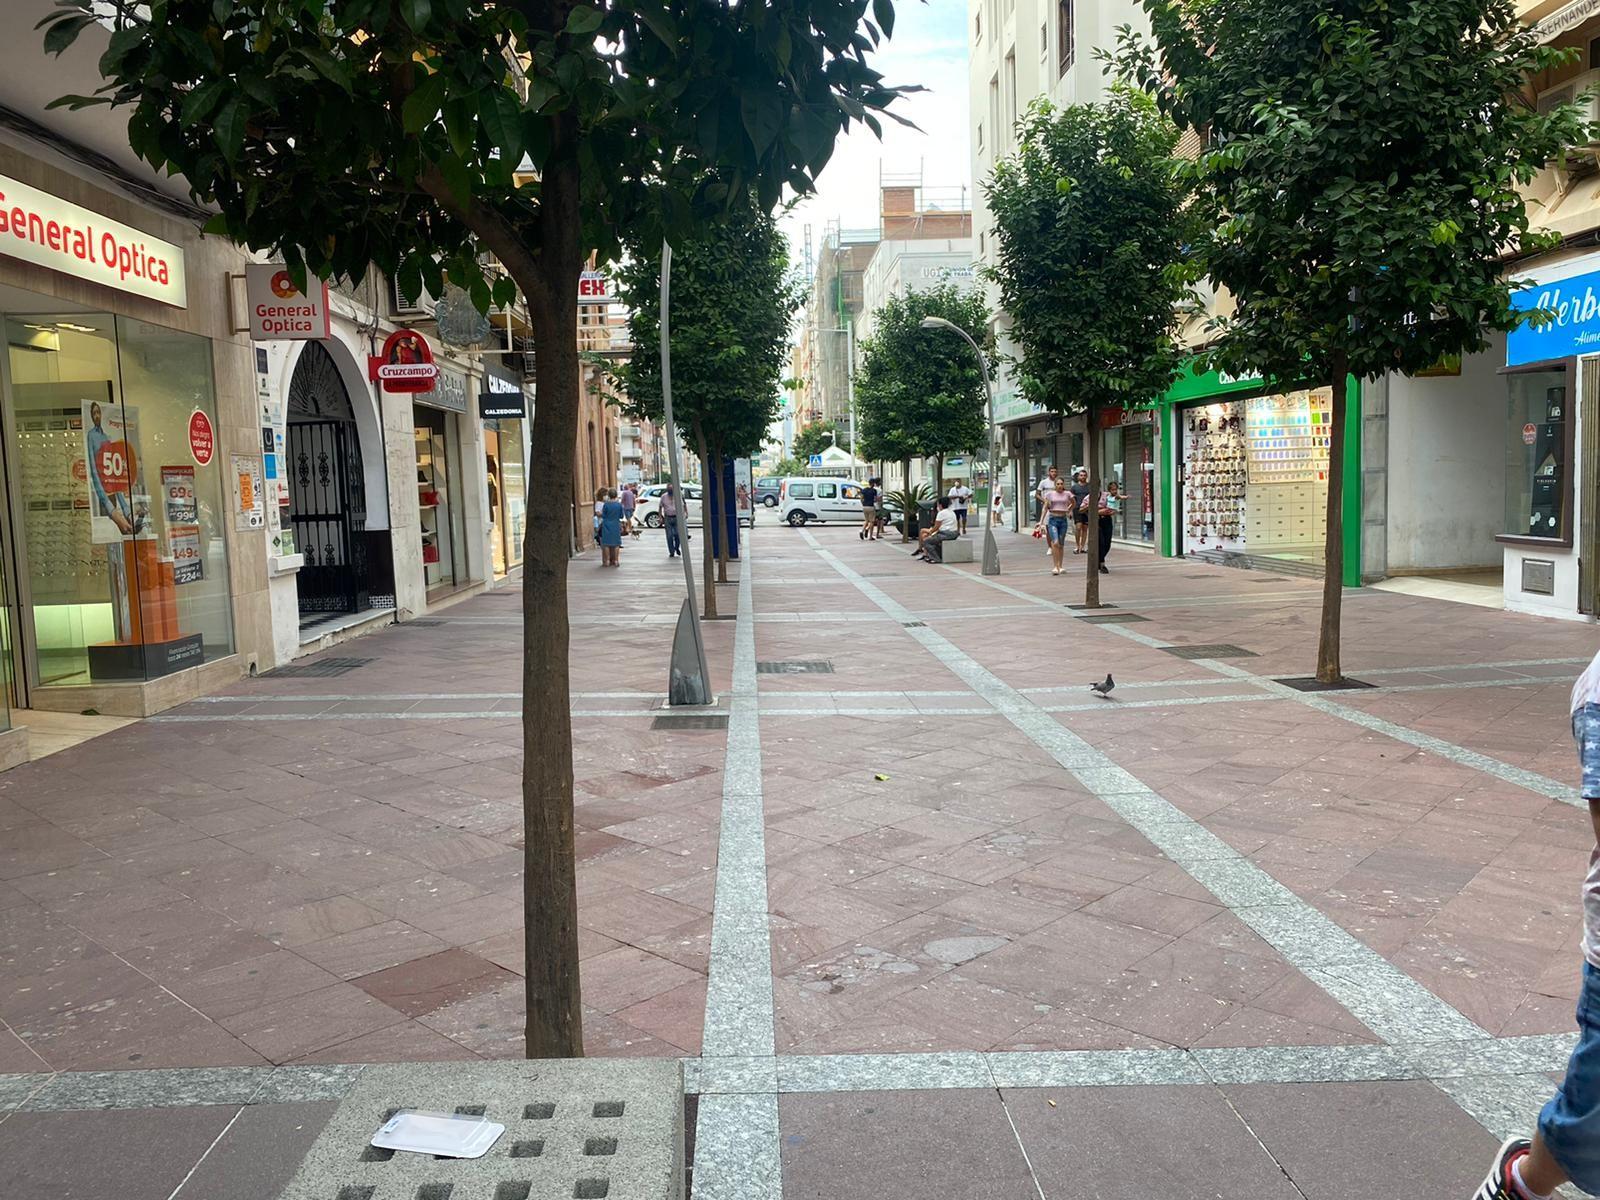 Ático en Algeciras, CENTRO, venta